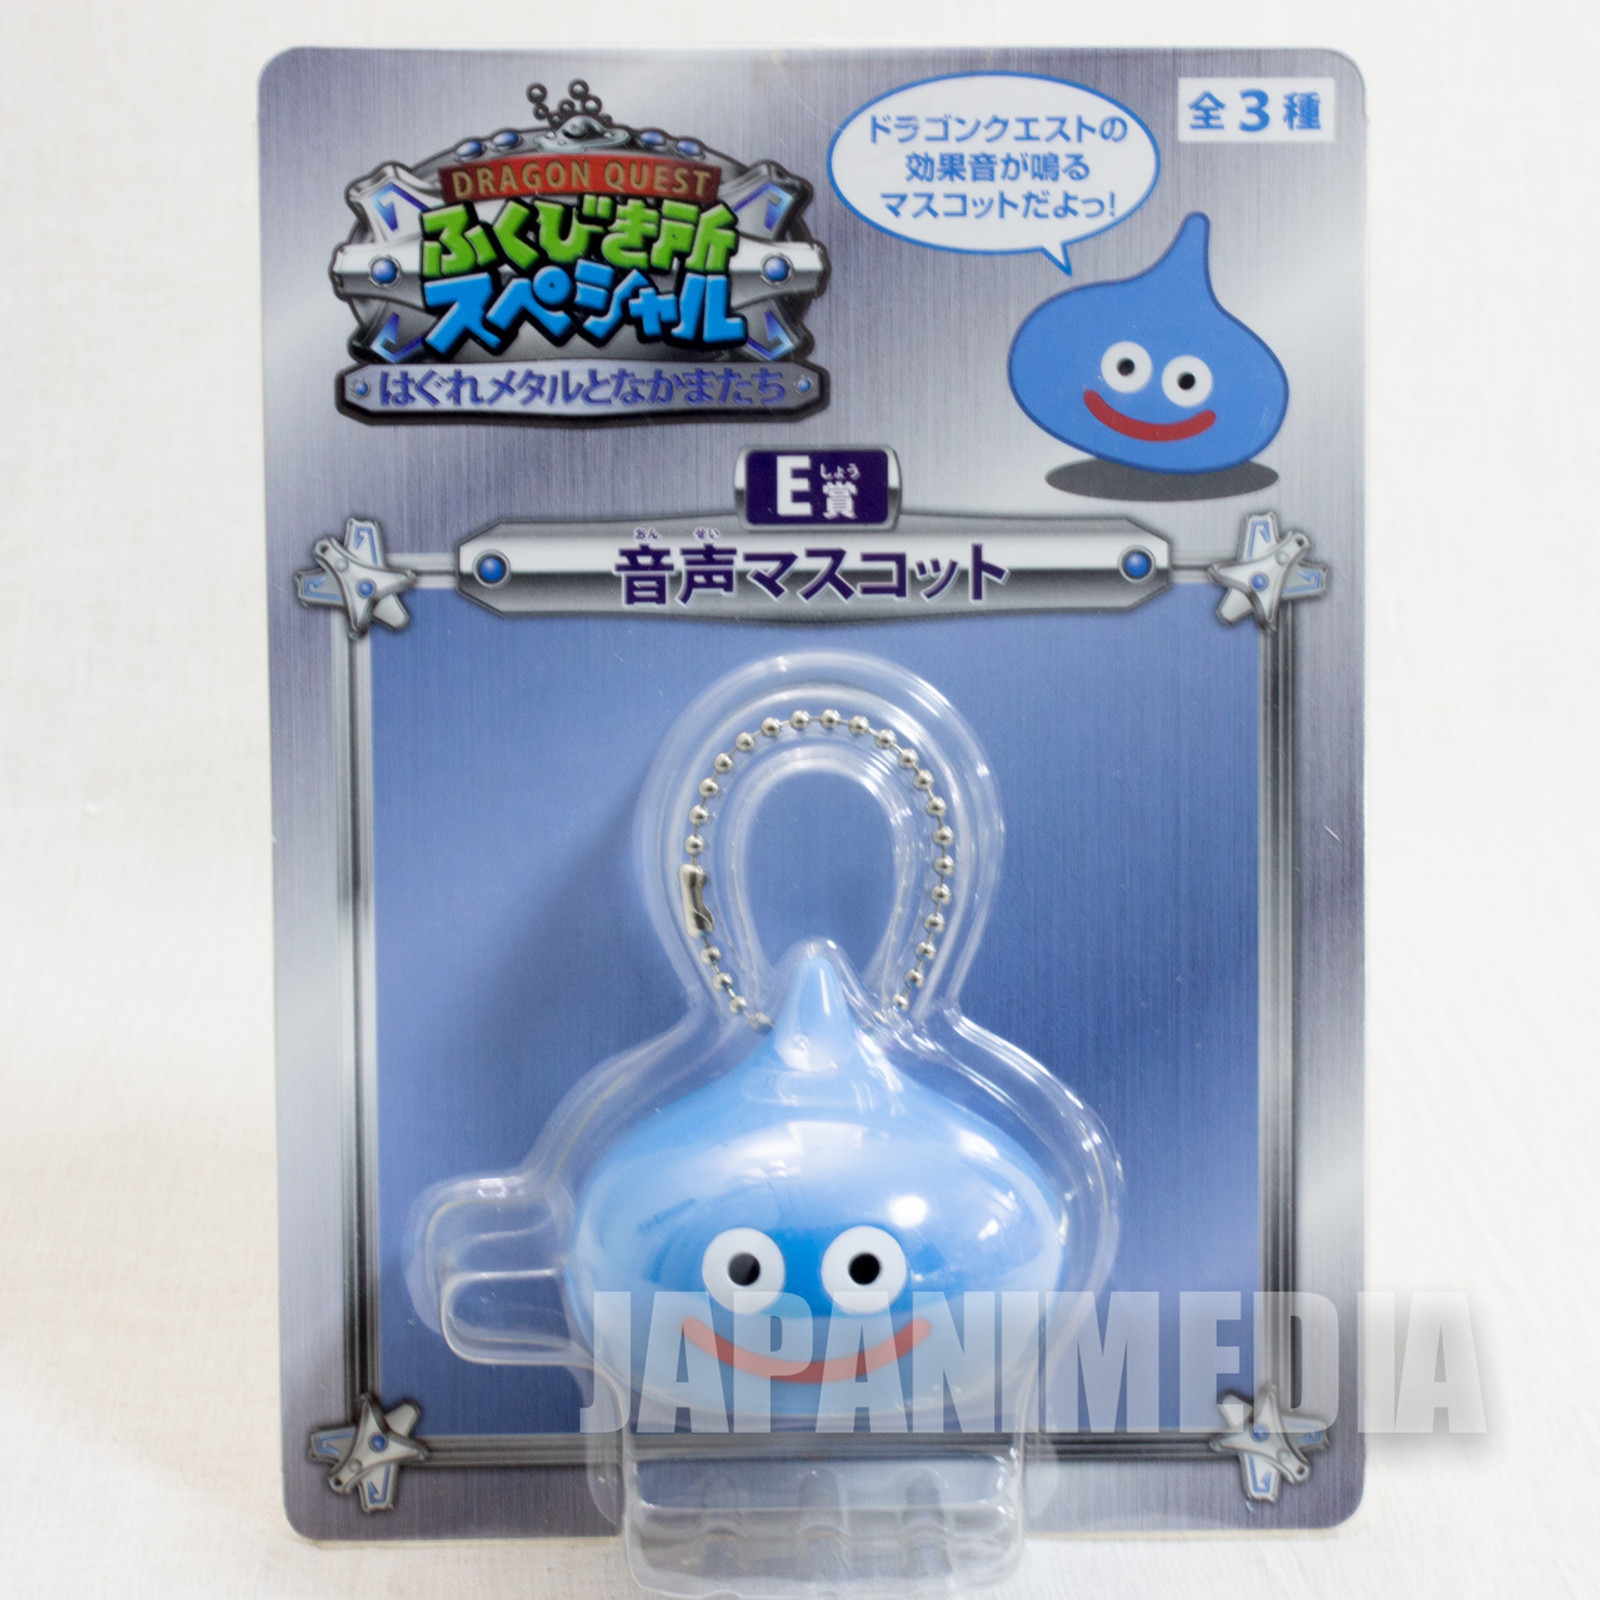 Dragon Quest Monster Slime Game SE Sound Figure Ballchain JAPAN WARRIOR